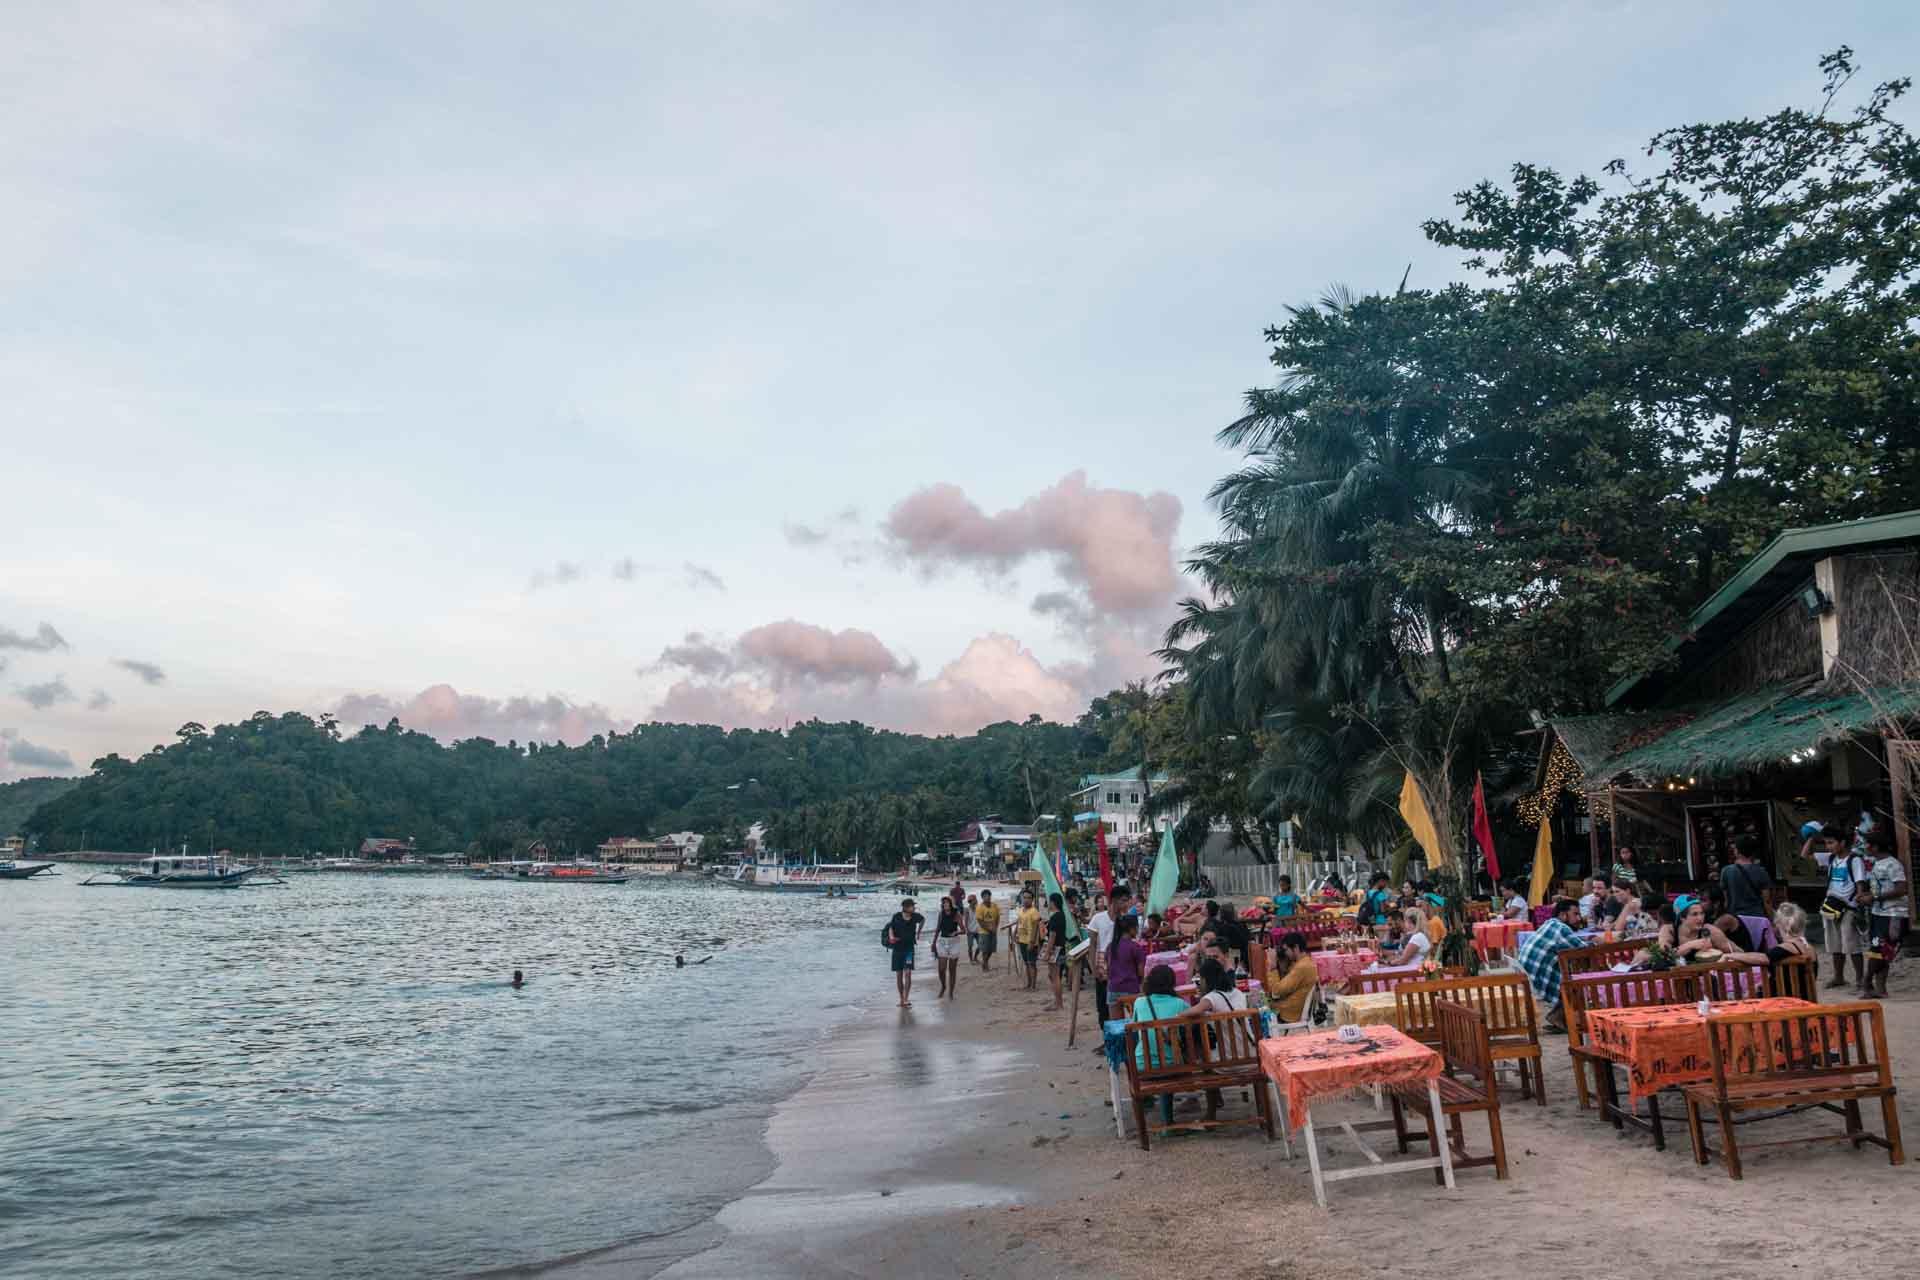 Restaurants at the beach in El Nido